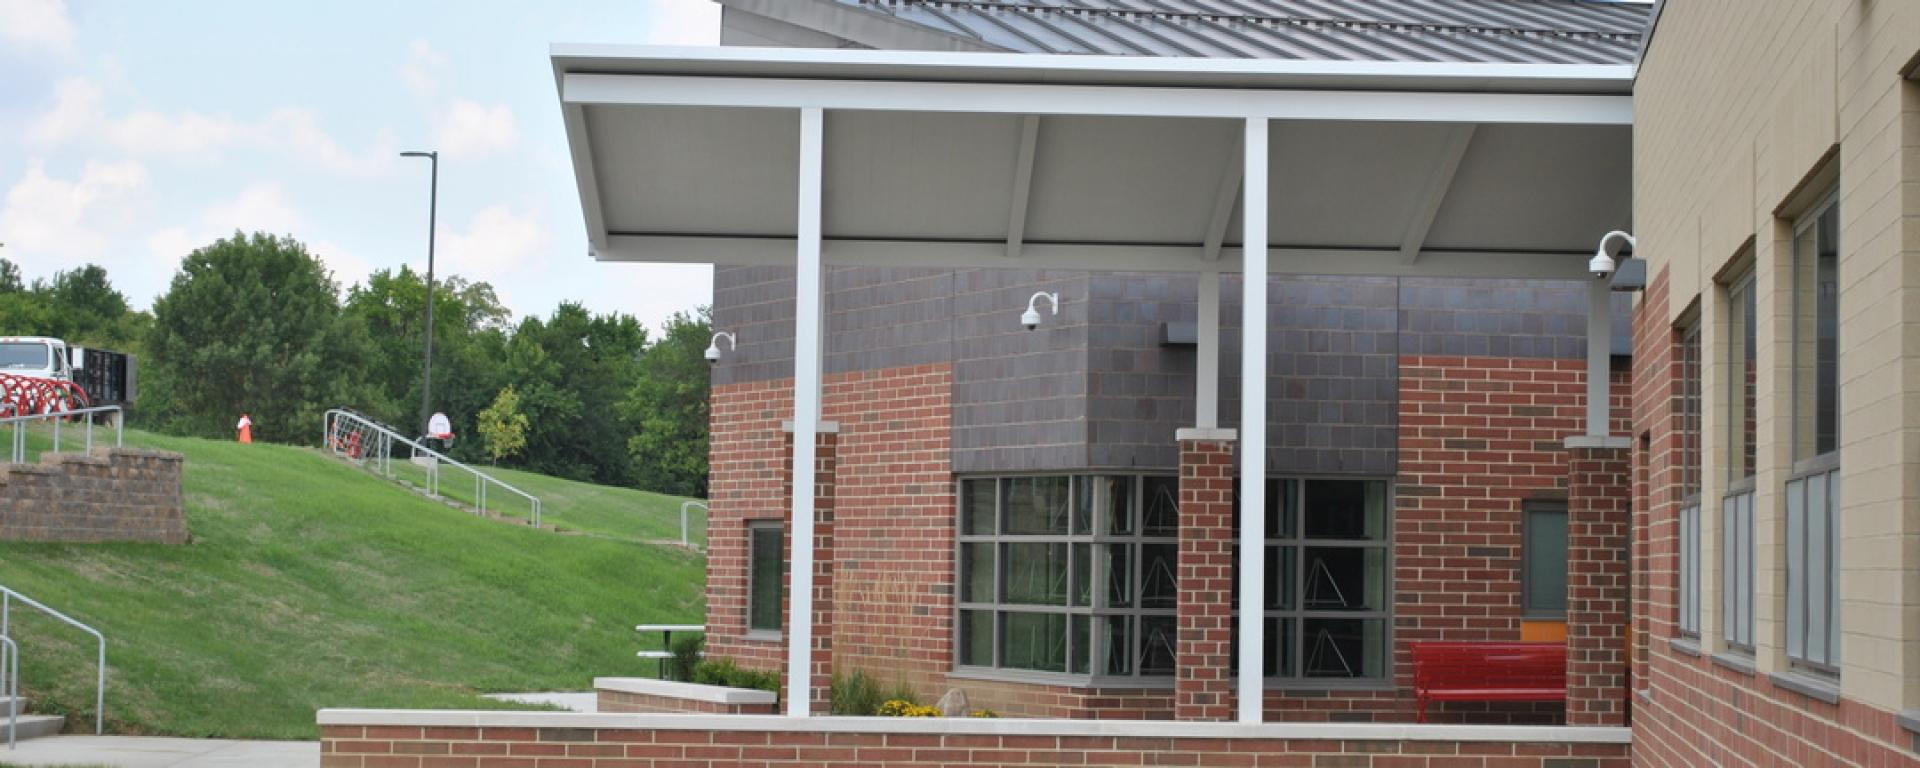 Front Entrance of Kramer Elementary